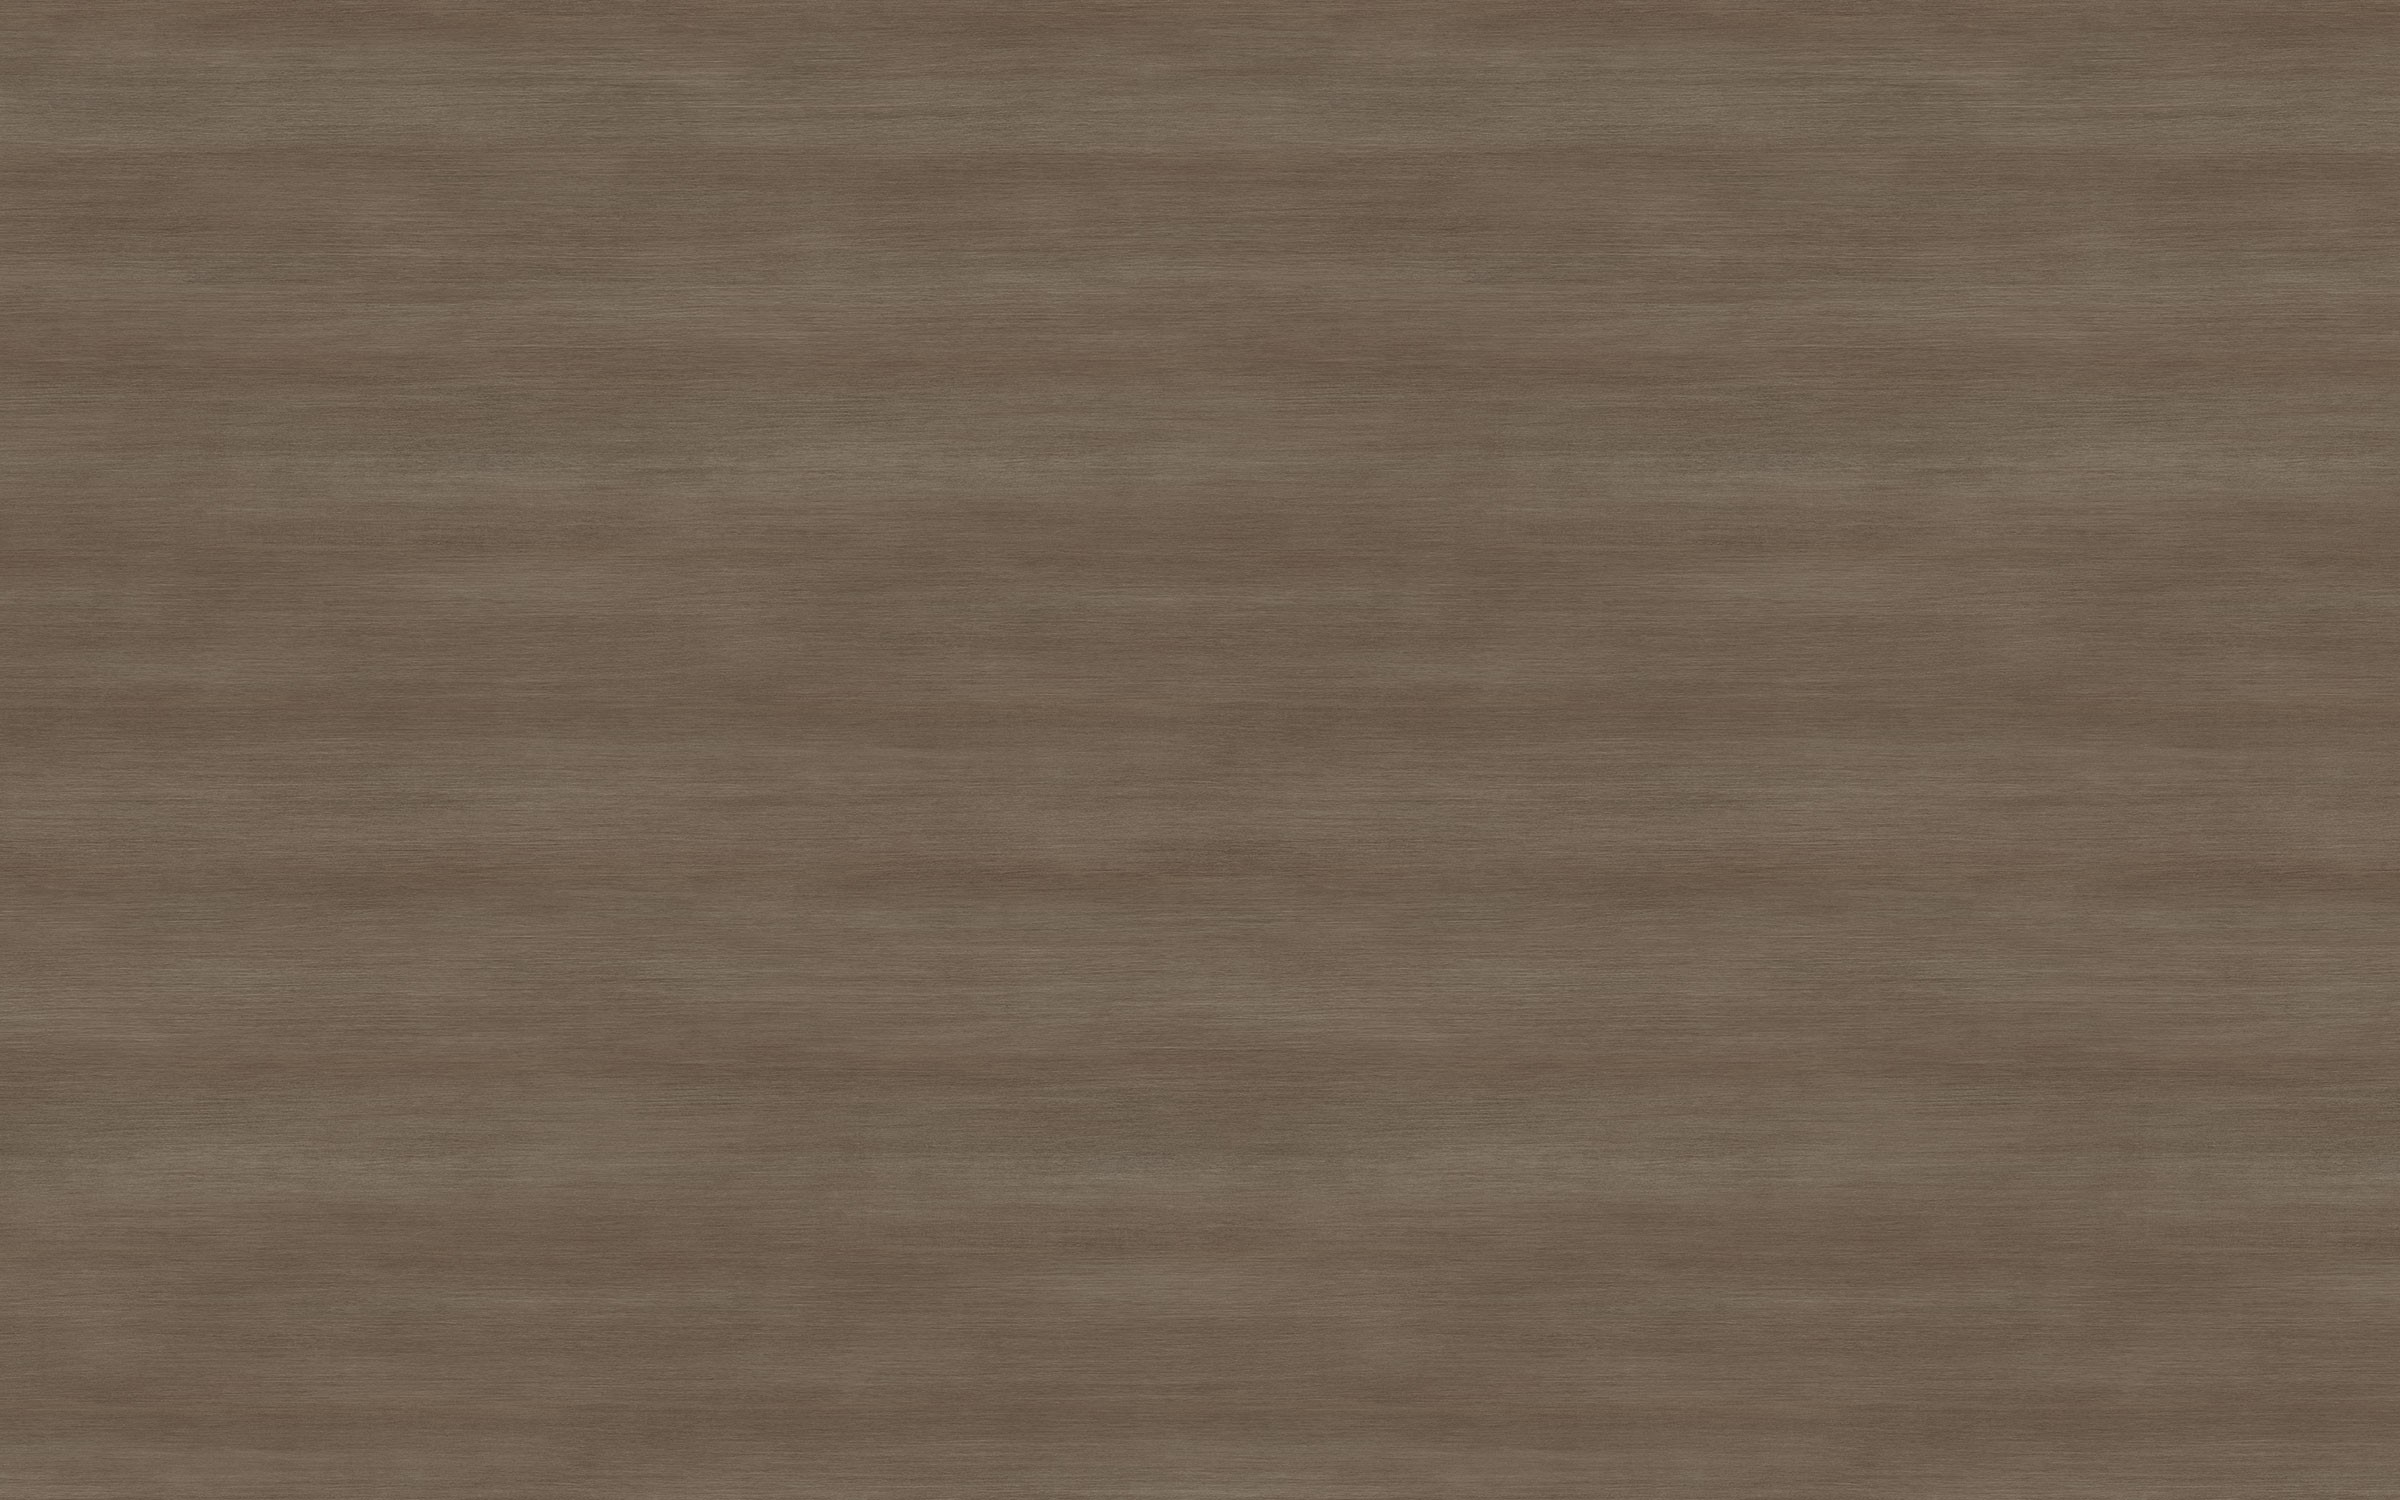 8213 Phantom Cocoa Laminate Countertops